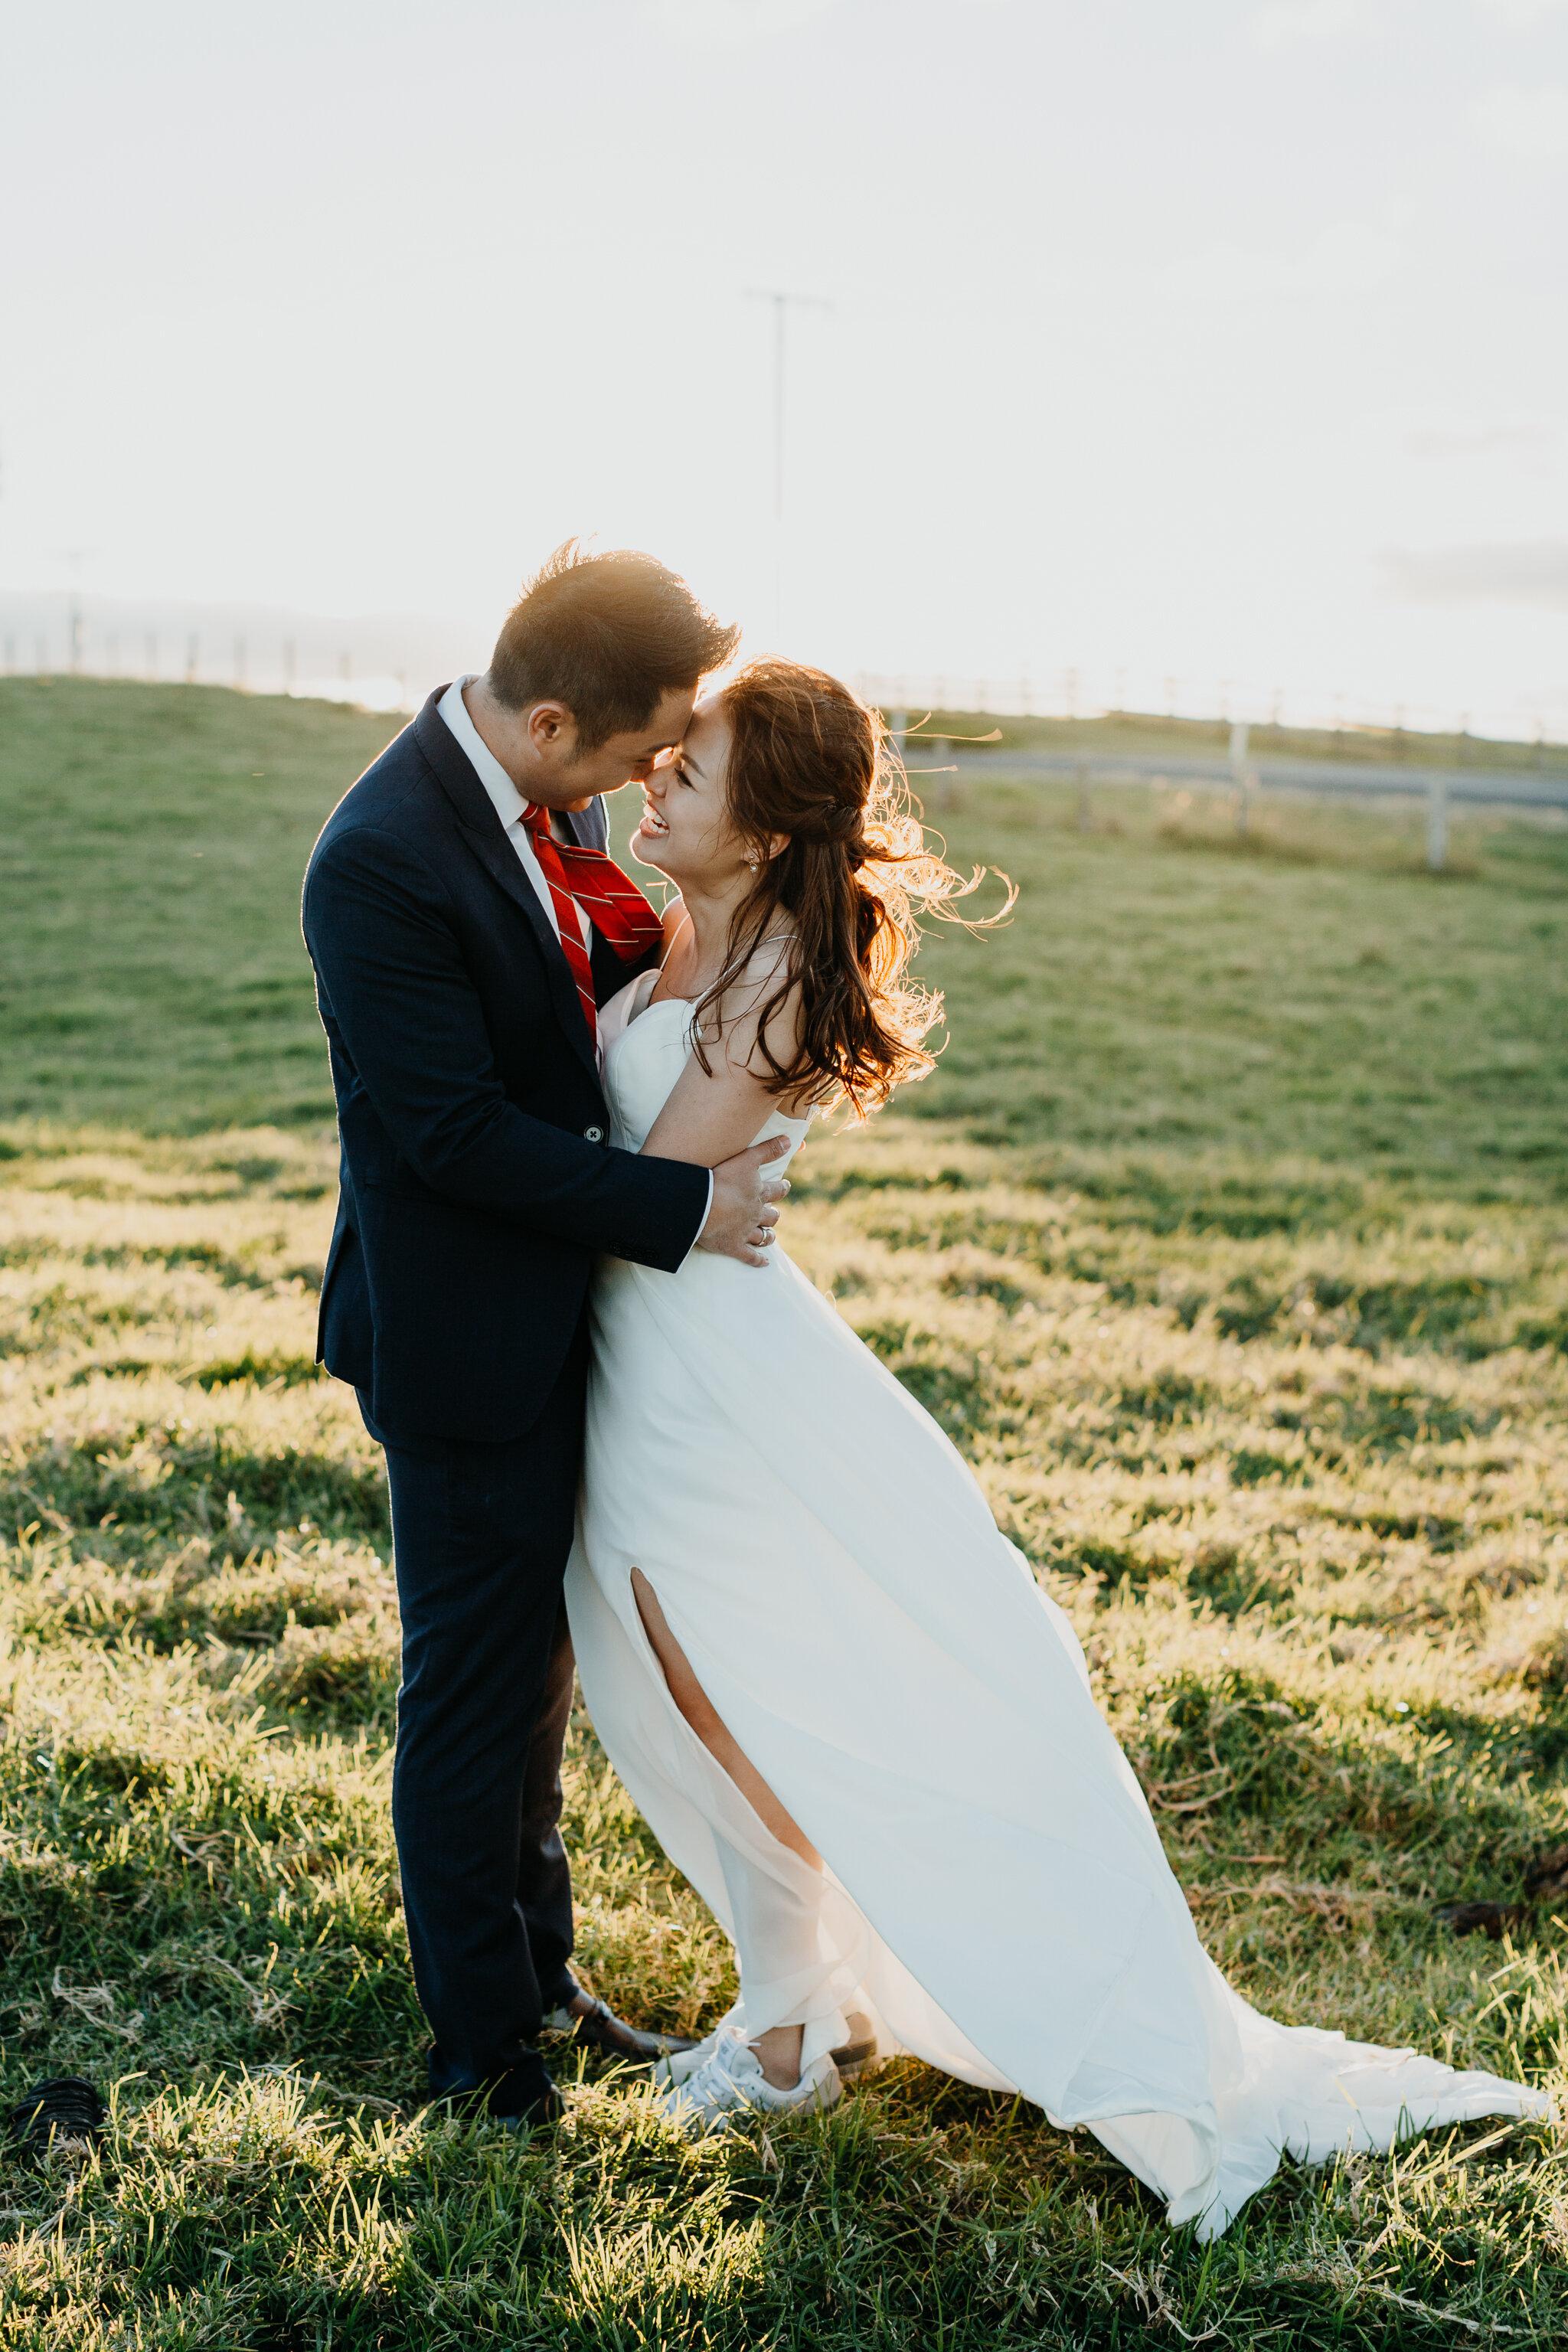 Maleny One Tree Hill Wedding - Maleny Wedding Photographer-22.jpg